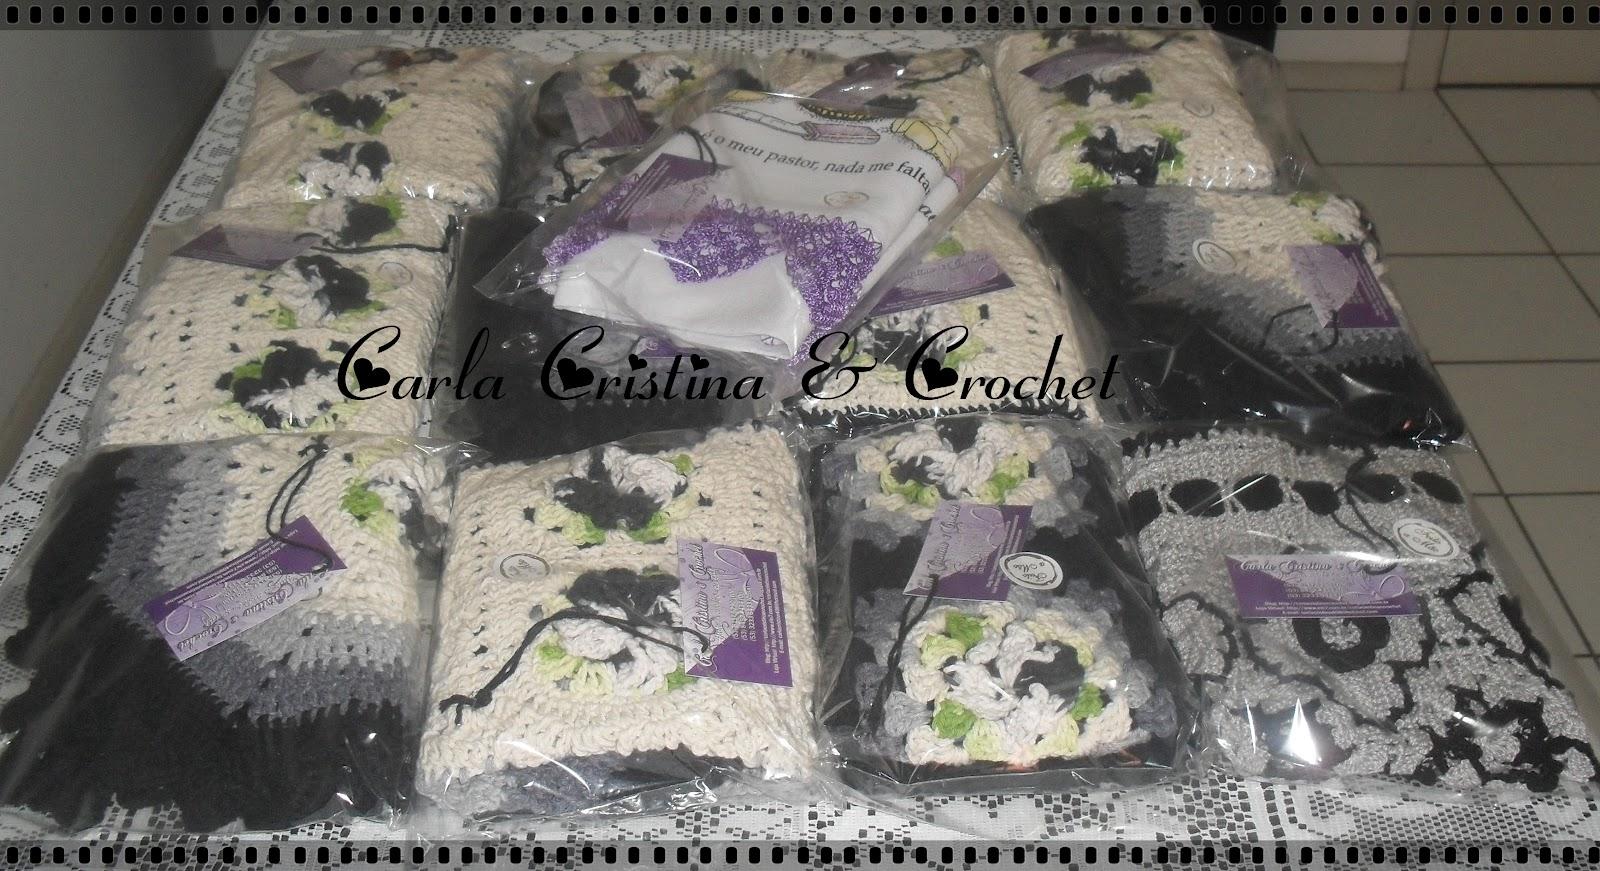 Carla Cristina & Crochet: Jogo de Banheiro Preto e Cinza #756D56 1600x871 Banheiro Cinza E Preto